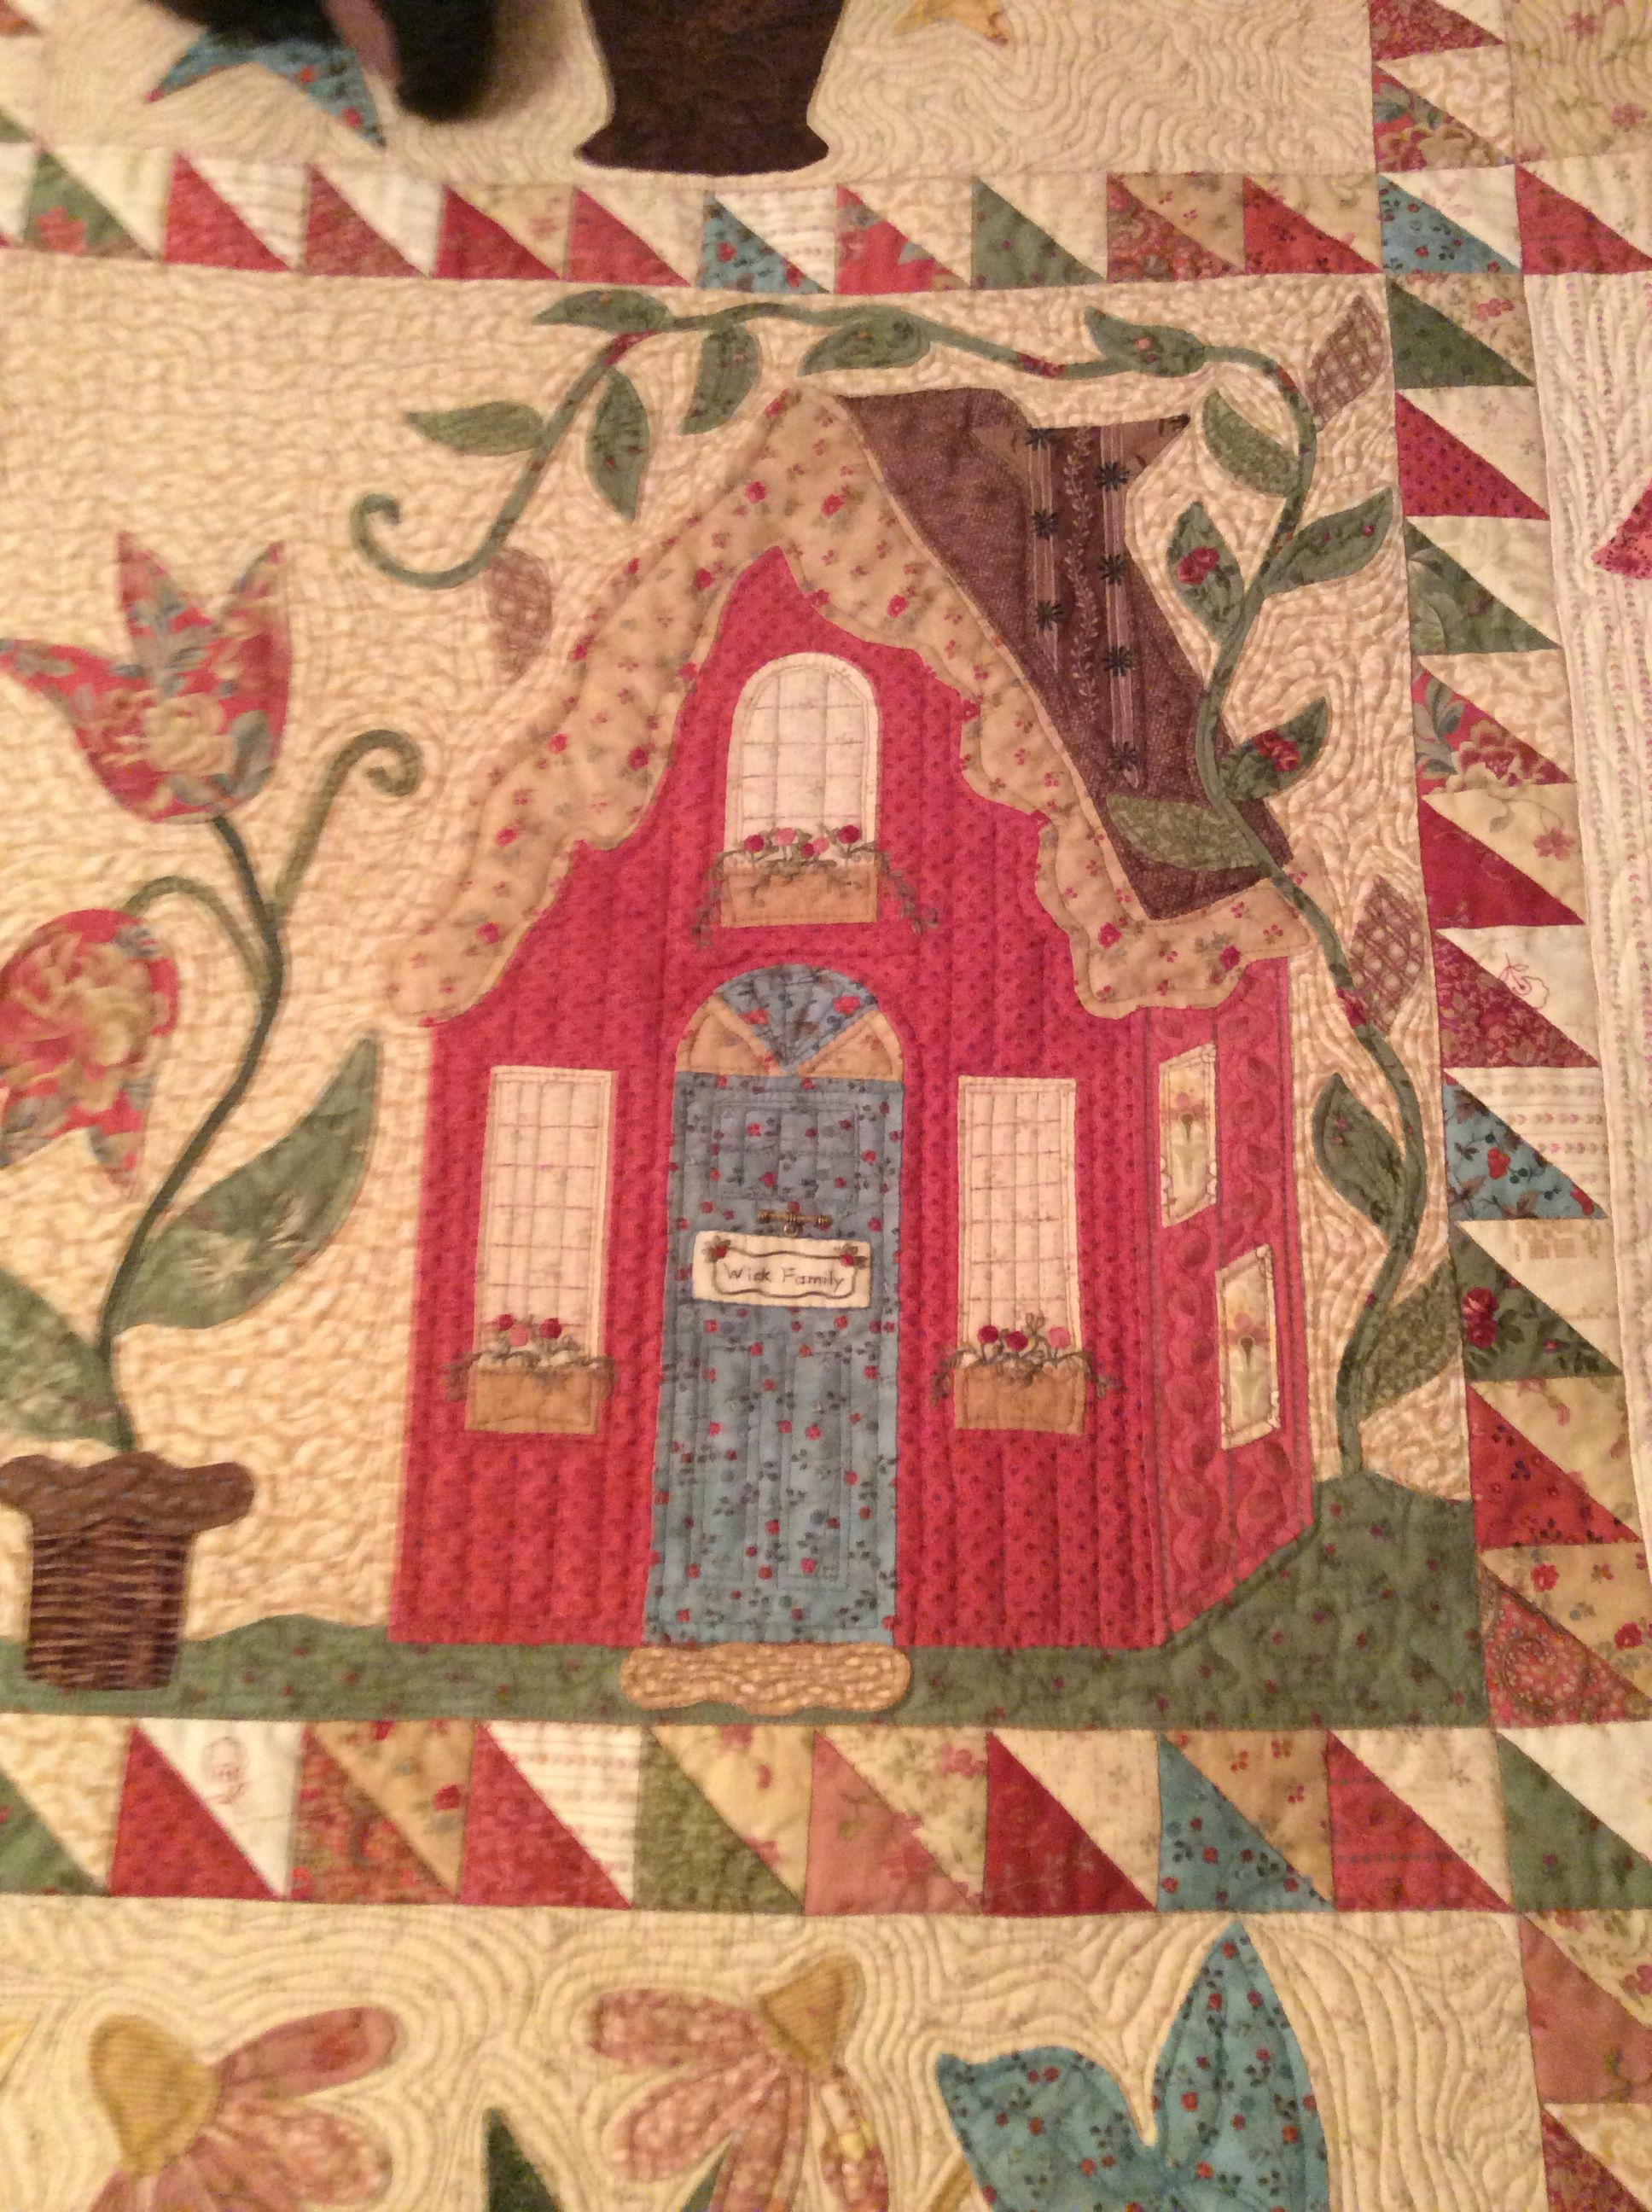 Pin by debra wick on debbie 39 s quilts pinterest for Blackbird designs english garden